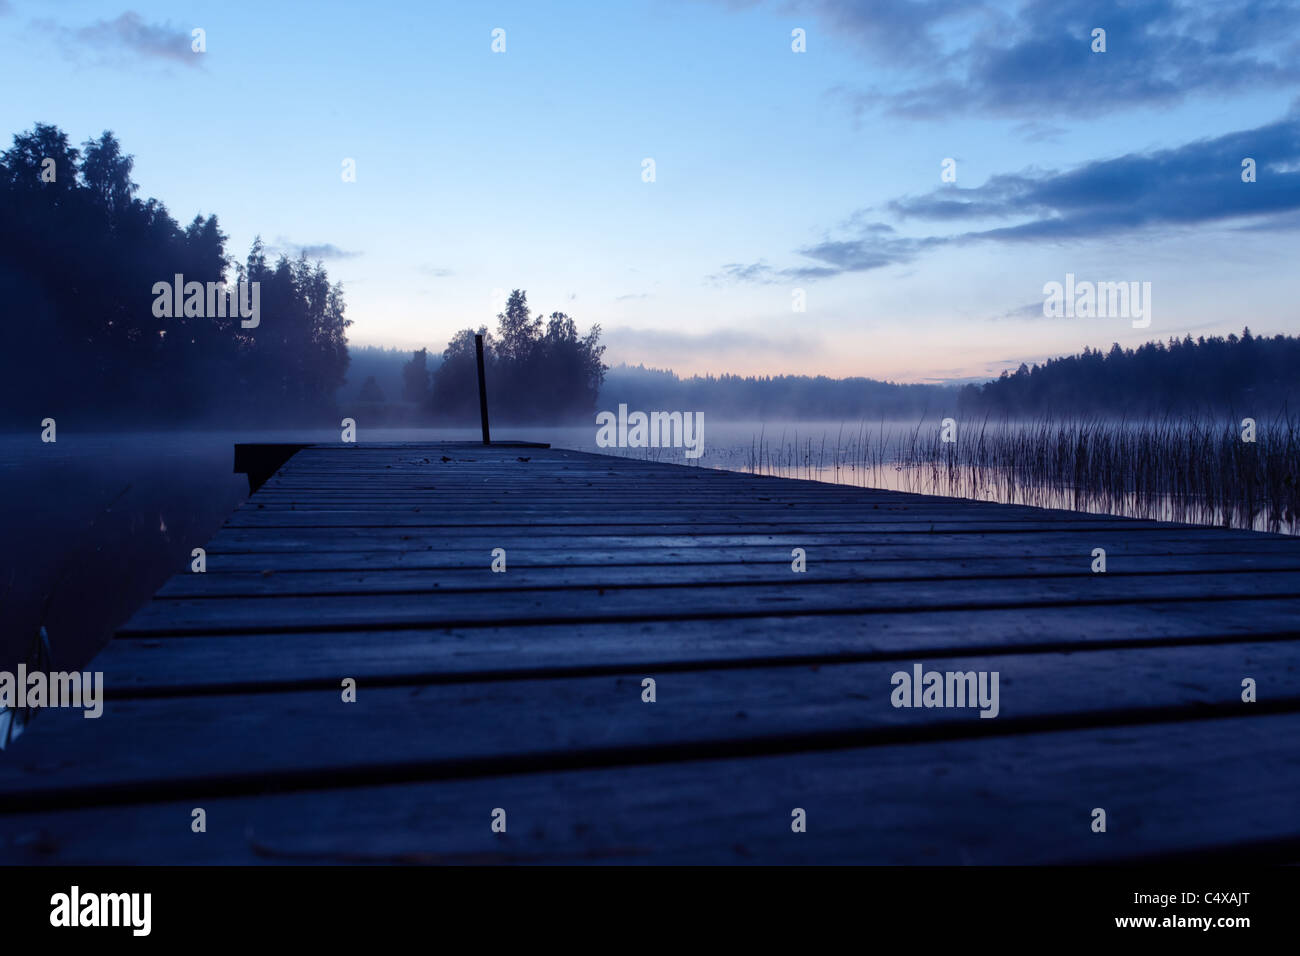 Very Calm Finnish Landscape During Midsummer Night Peer - Stock Image